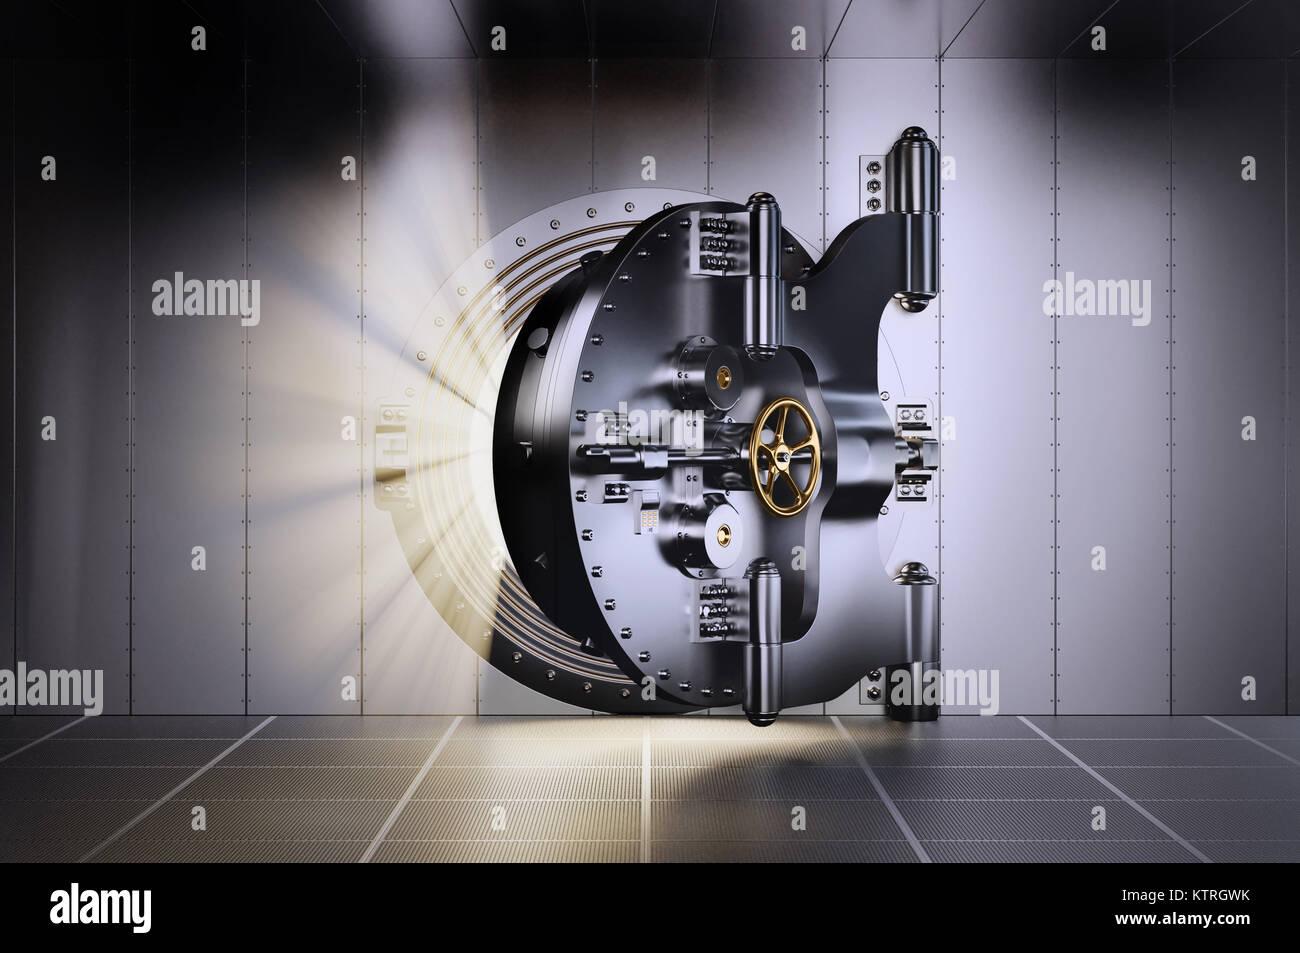 3d Illustration of Opened Bank Vault Door with light streaks - Stock Image